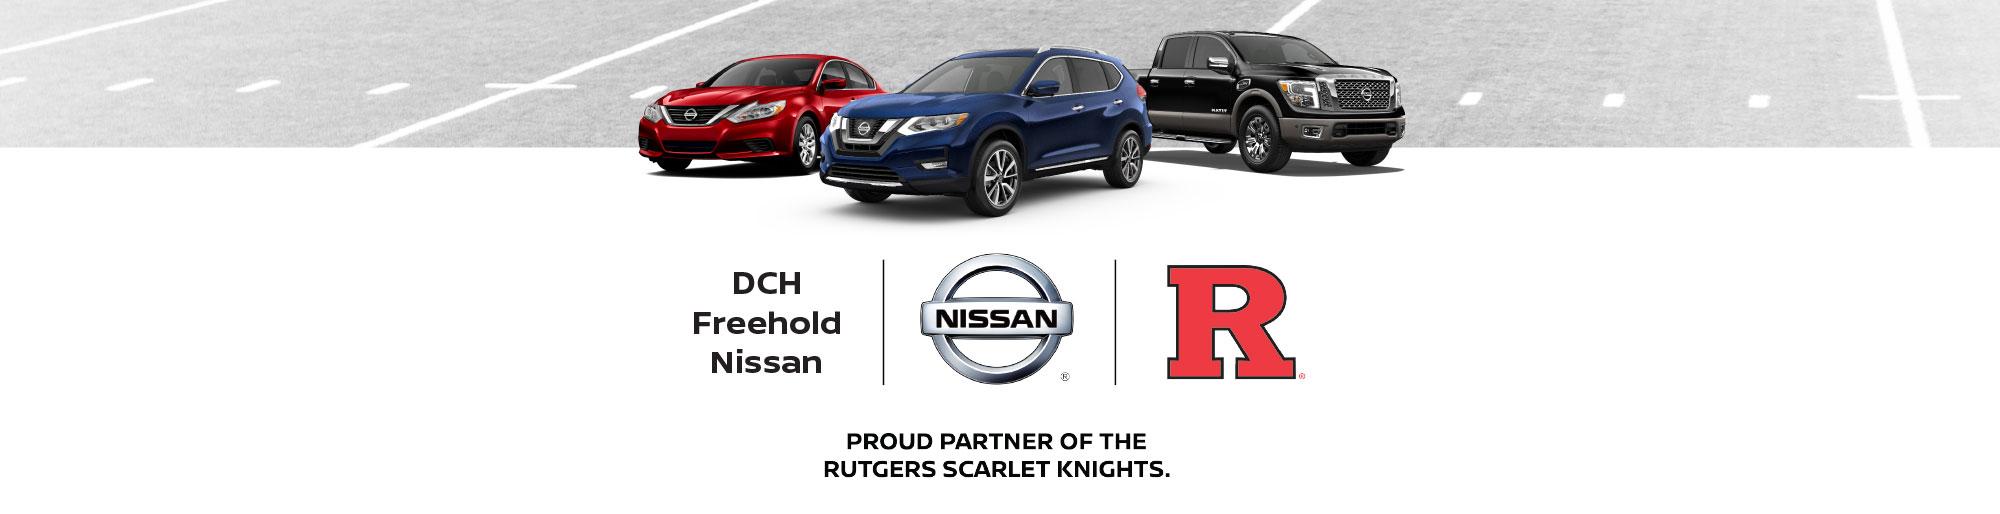 Nissan Dealership near Howell, NJ | DCH Freehold Nissan